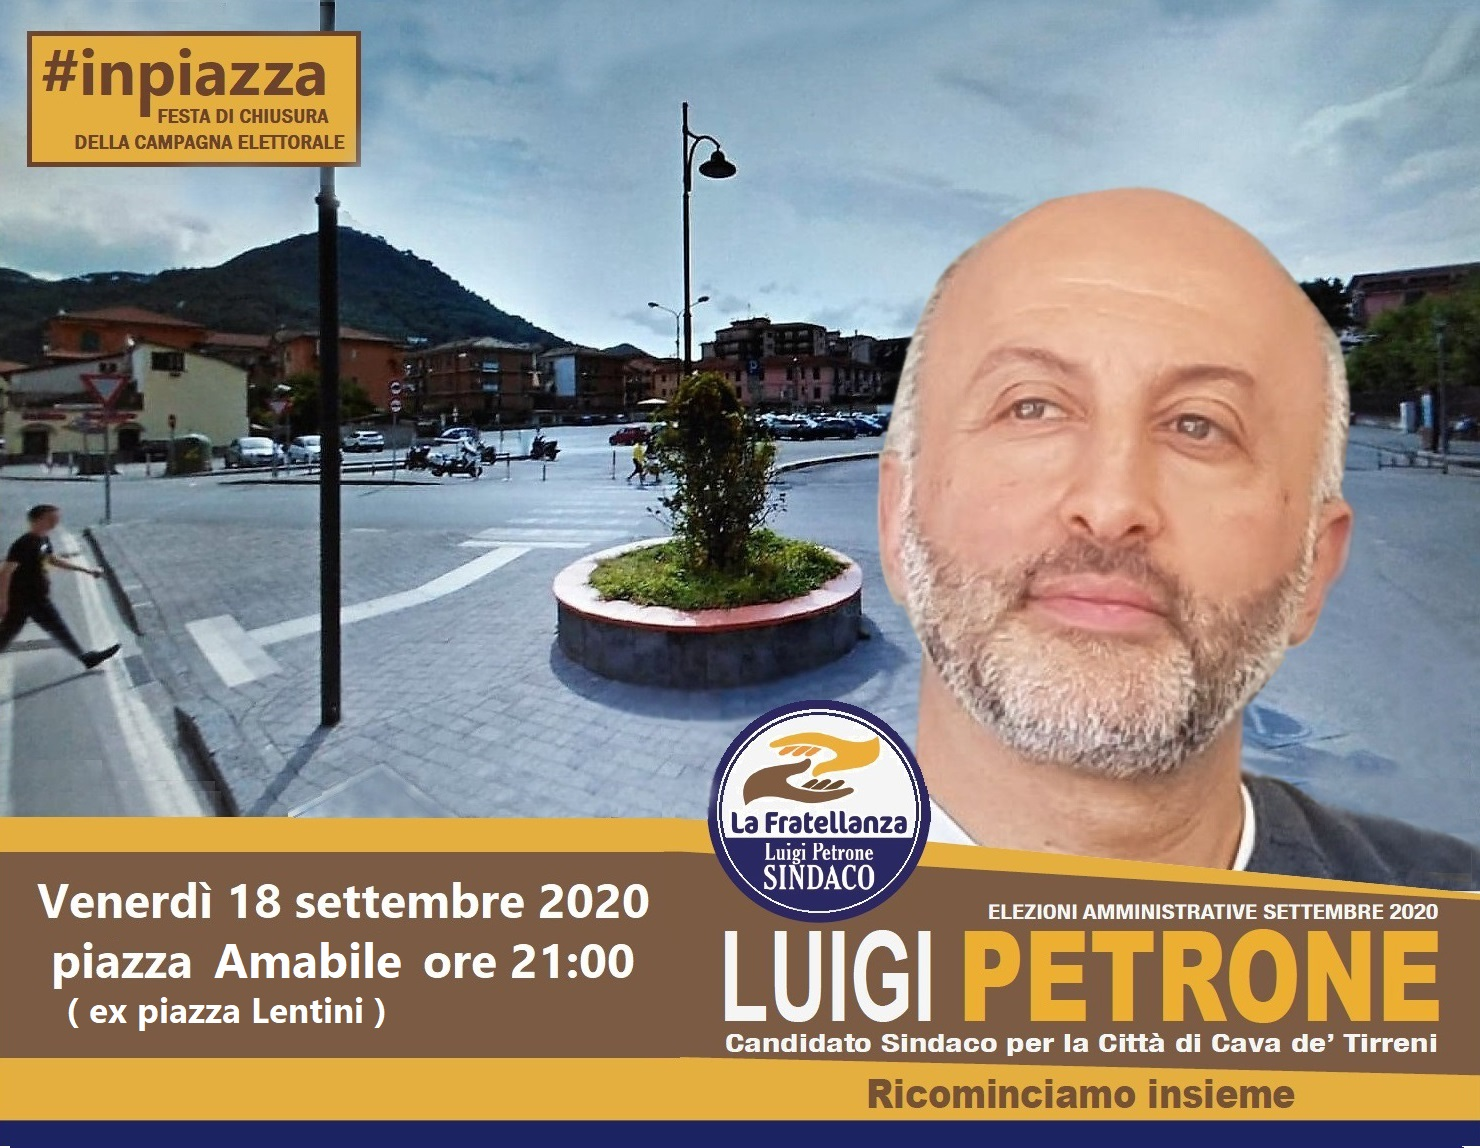 CHIUSURA CAMPAGNA ELETTORALE: VENERDì 18/09/2020 – ORE 21:00 piazza AMABILE (ex piazza Lentini)